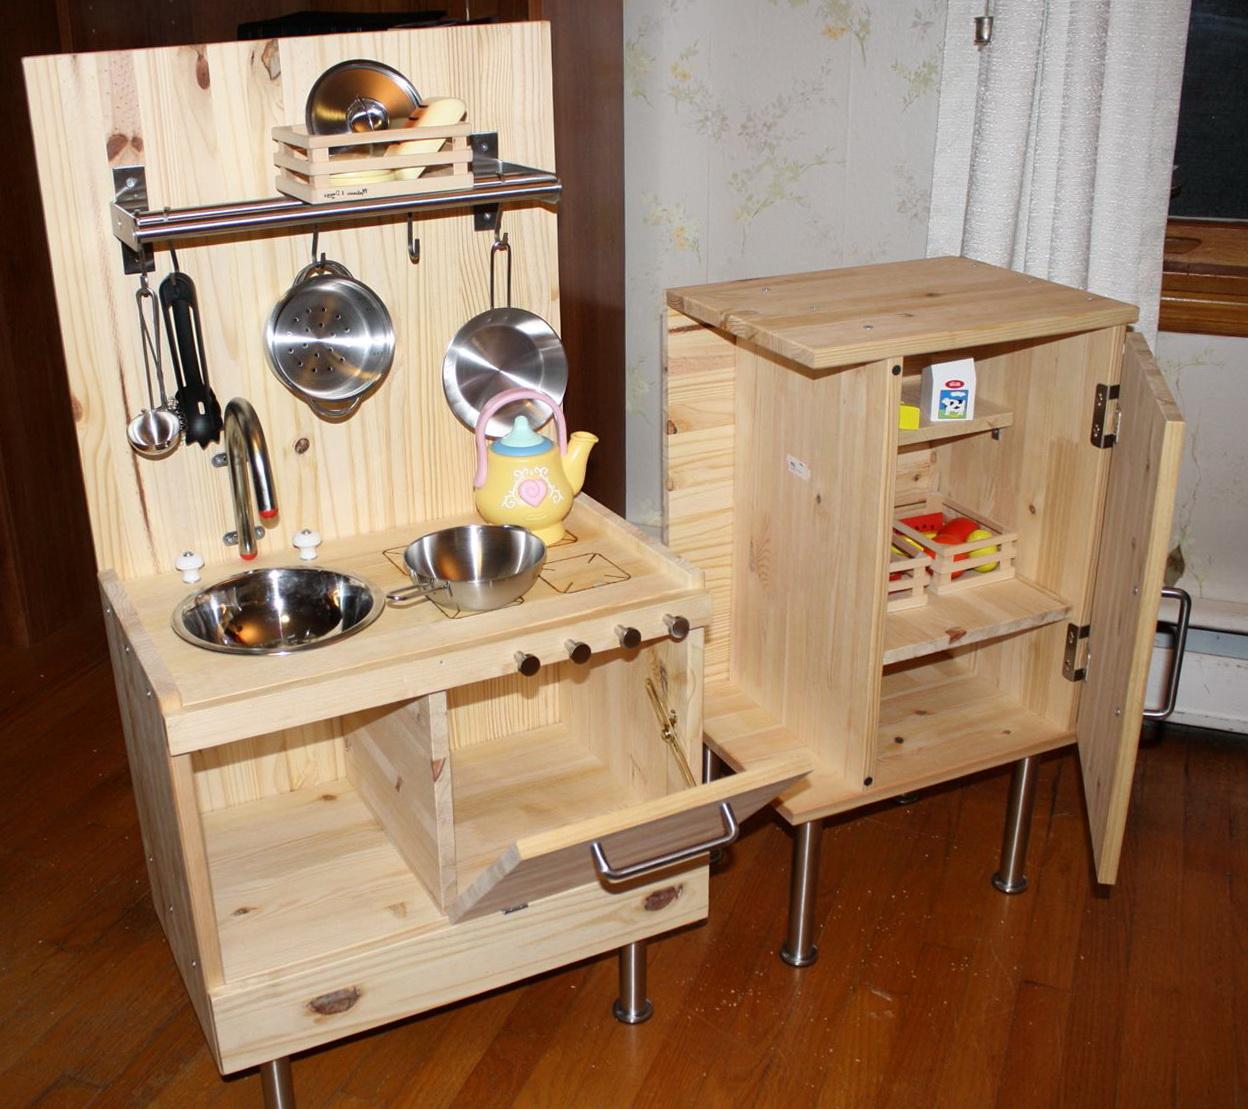 Toy Kitchen Sets Ikea